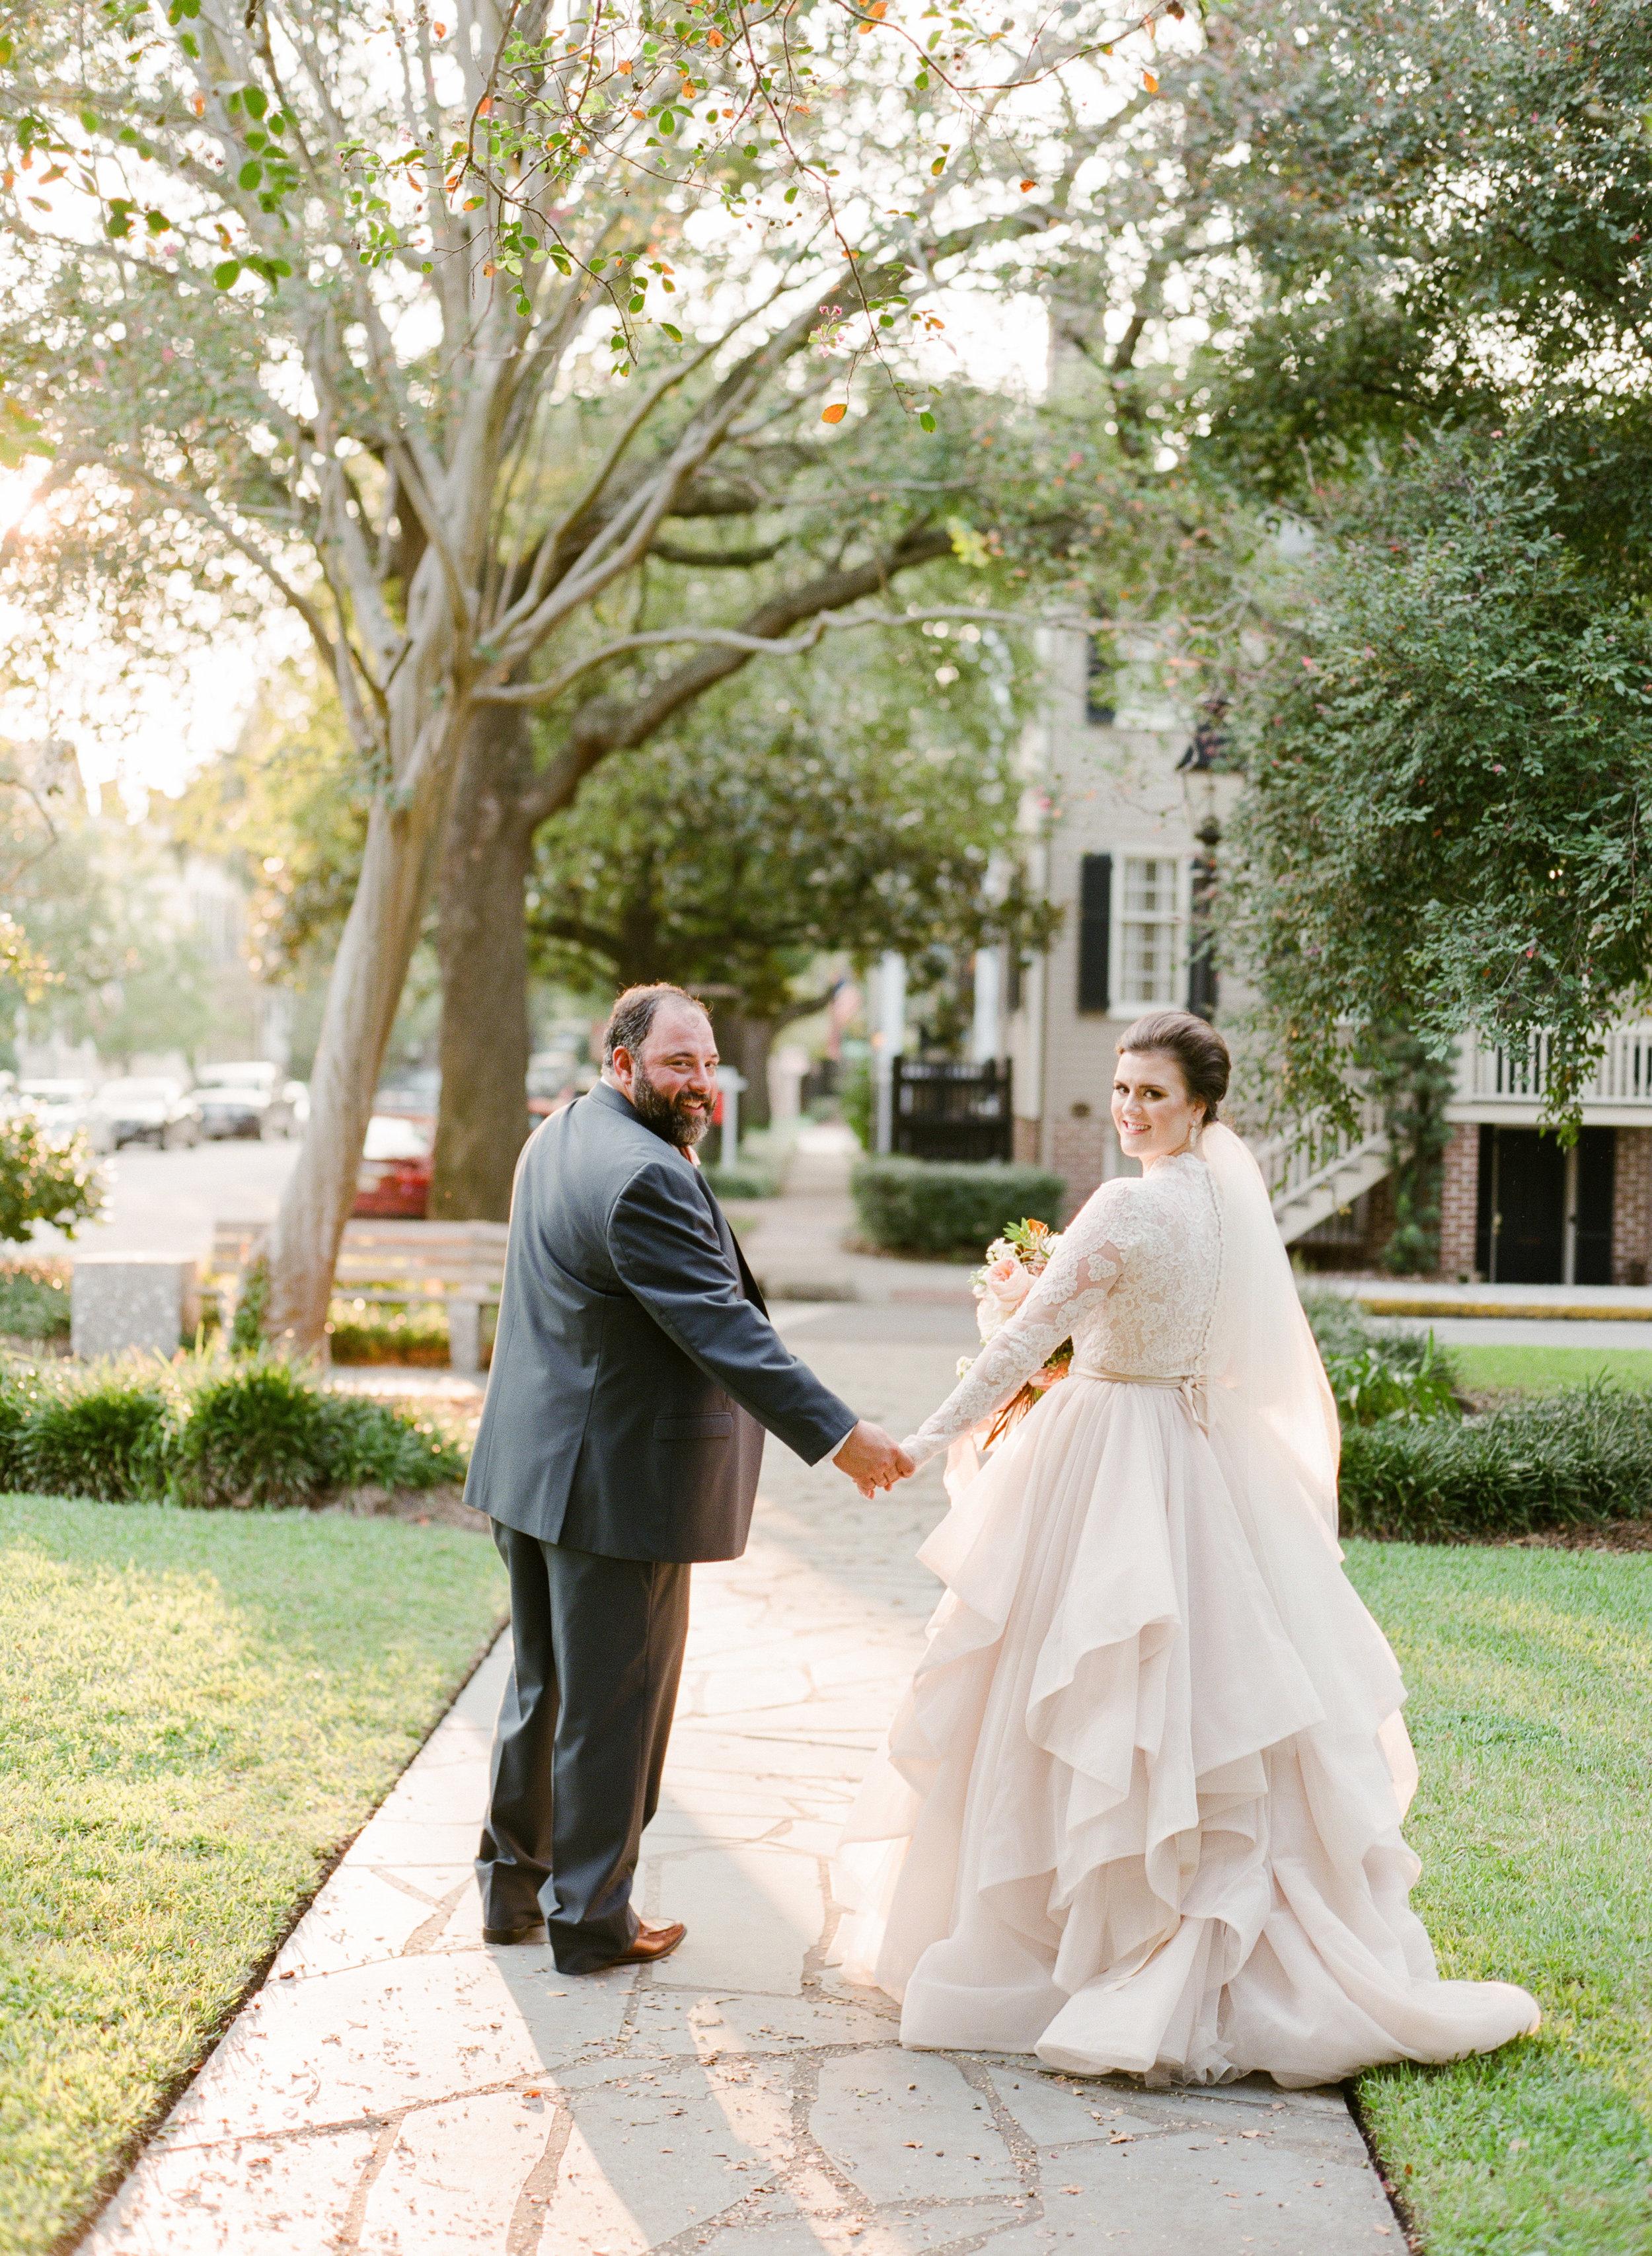 savannah-cha-bella-wedding-45.jpg